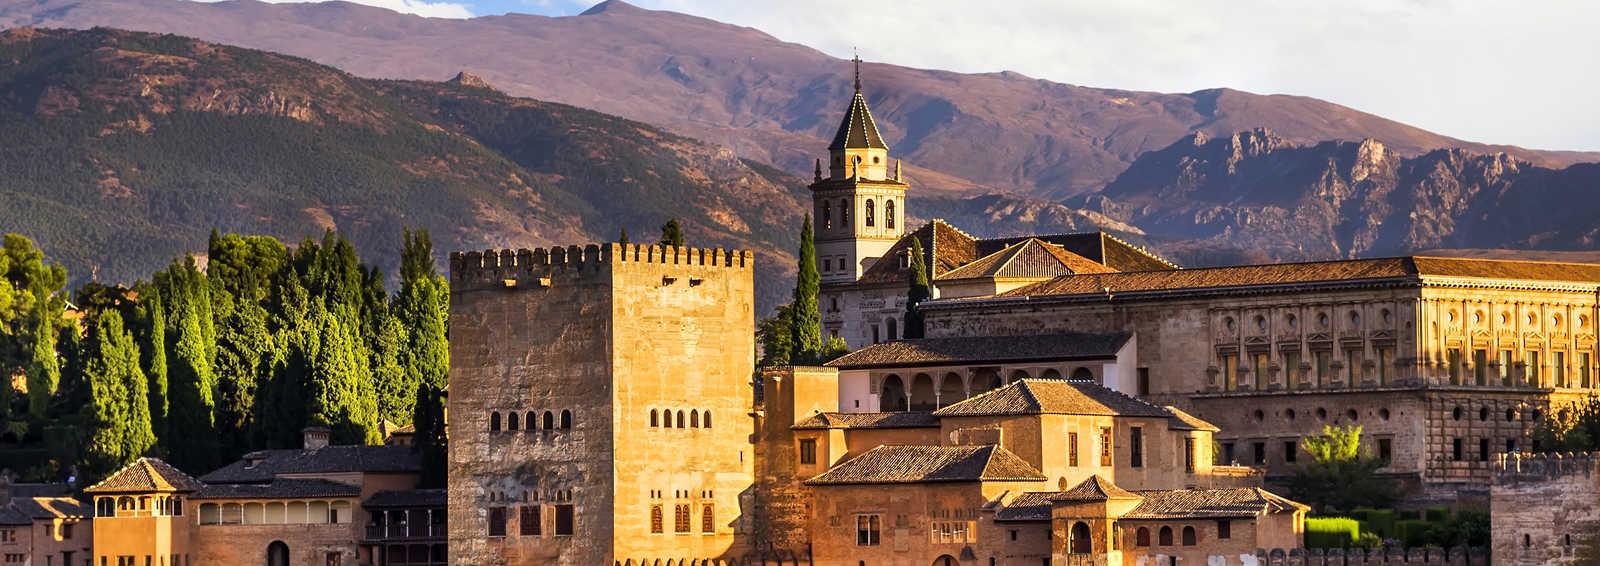 Alhambra, Granada, Spain